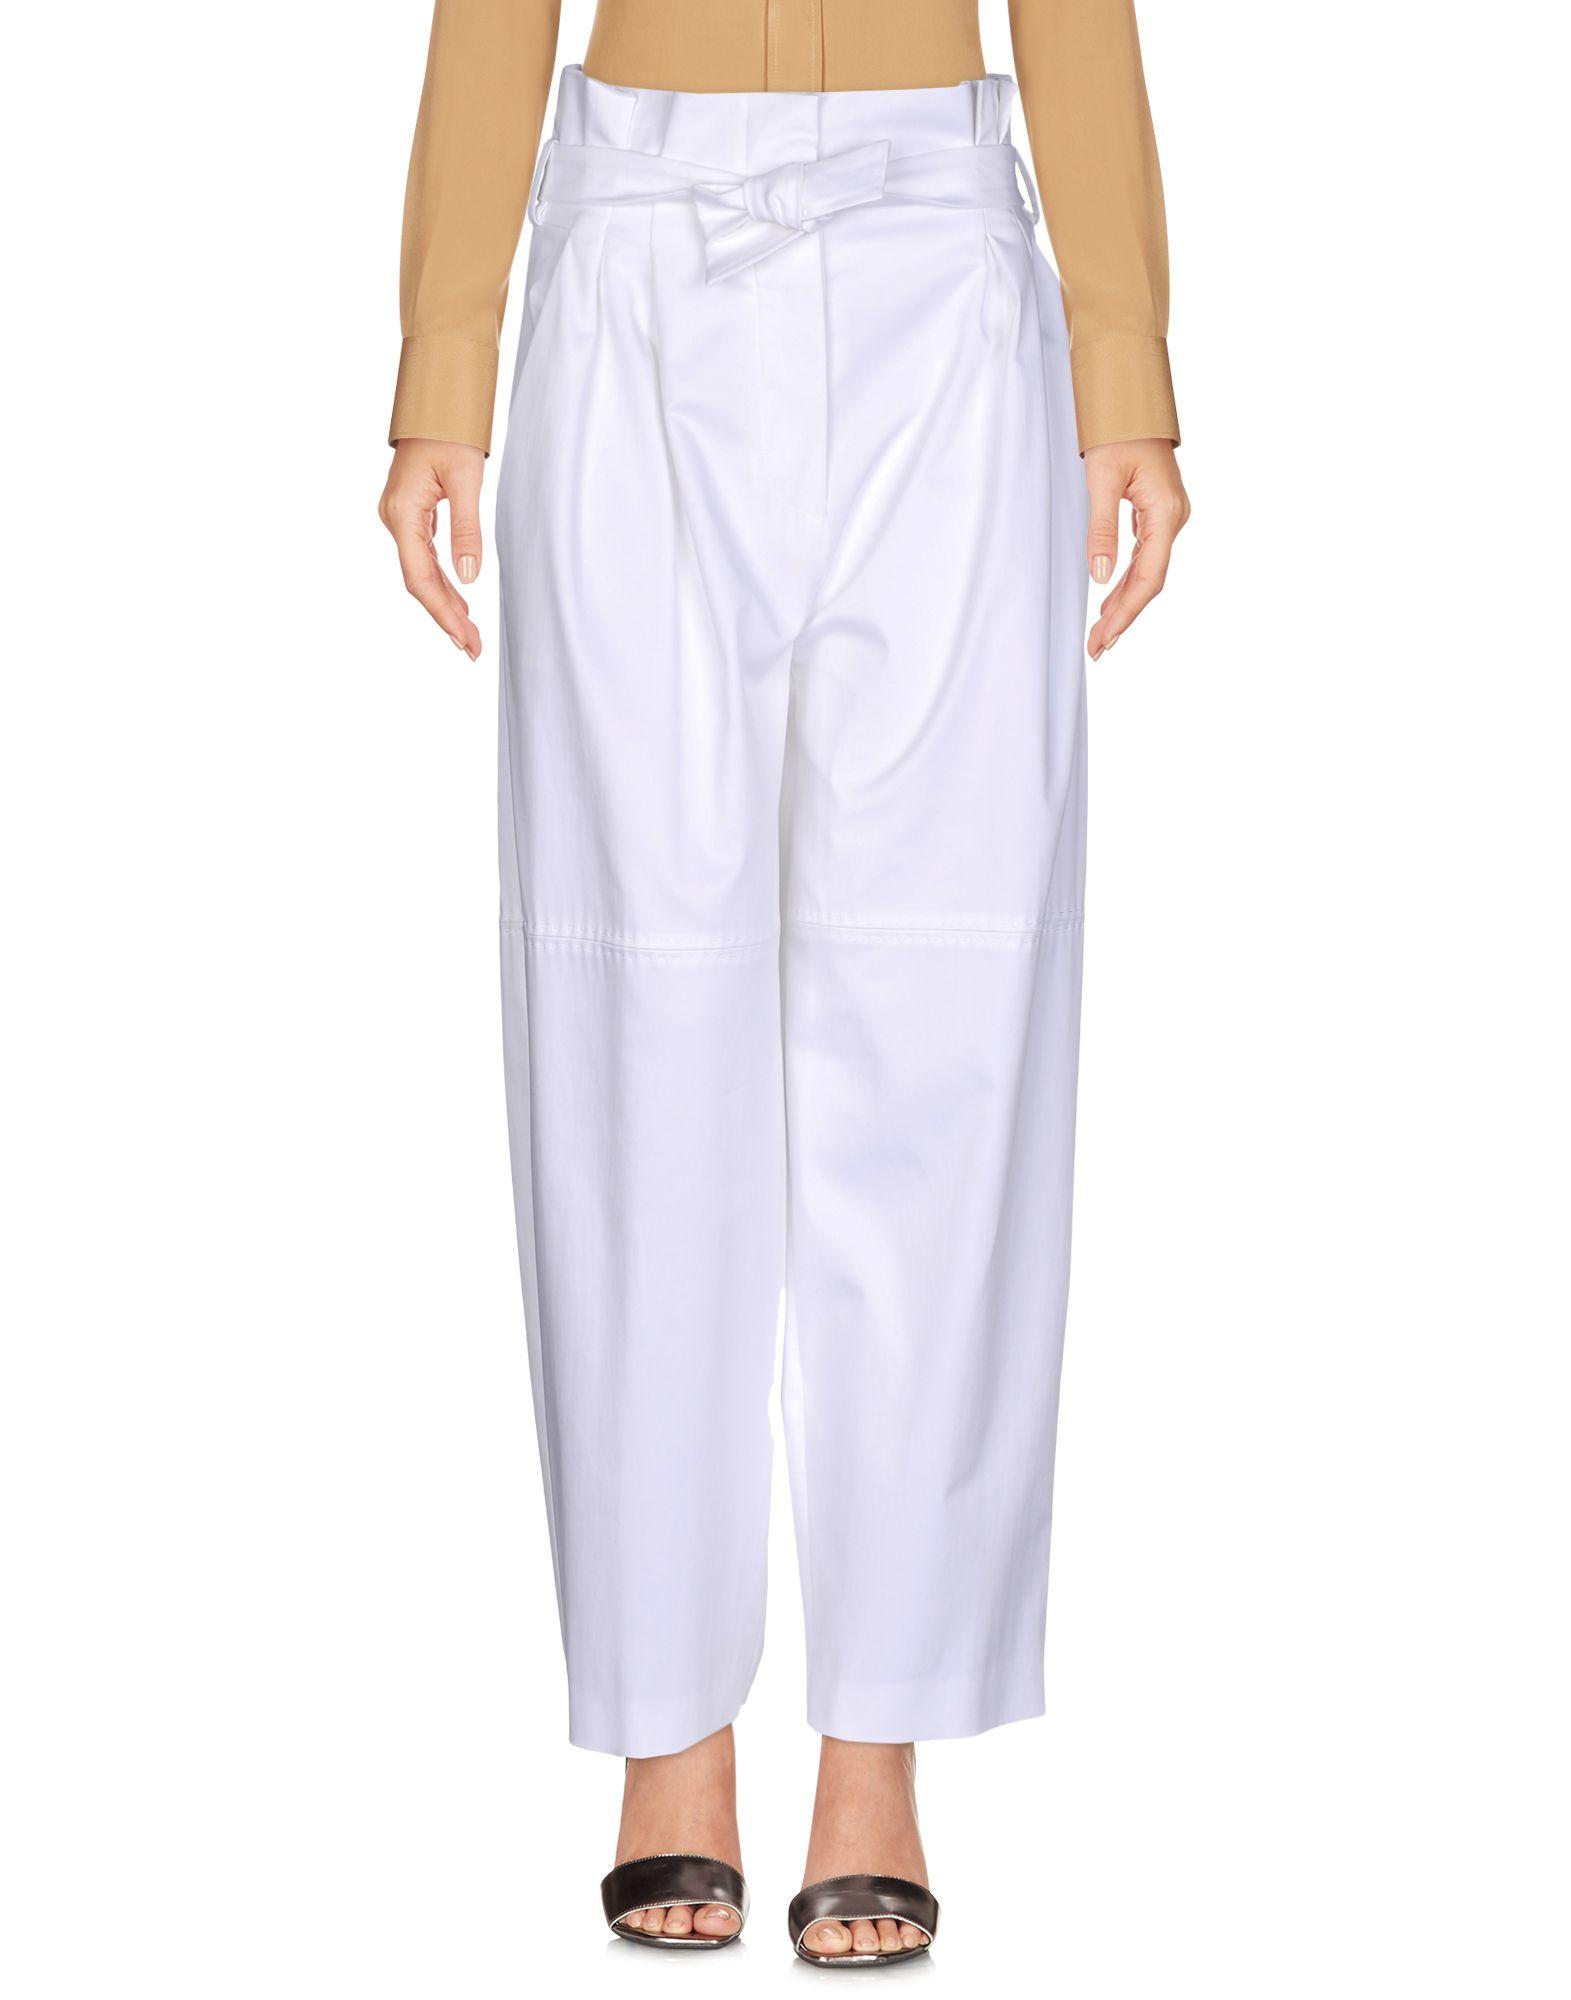 ALBERTA FERRETTI Damen Hose Farbe Weiß Größe 6 - broschei